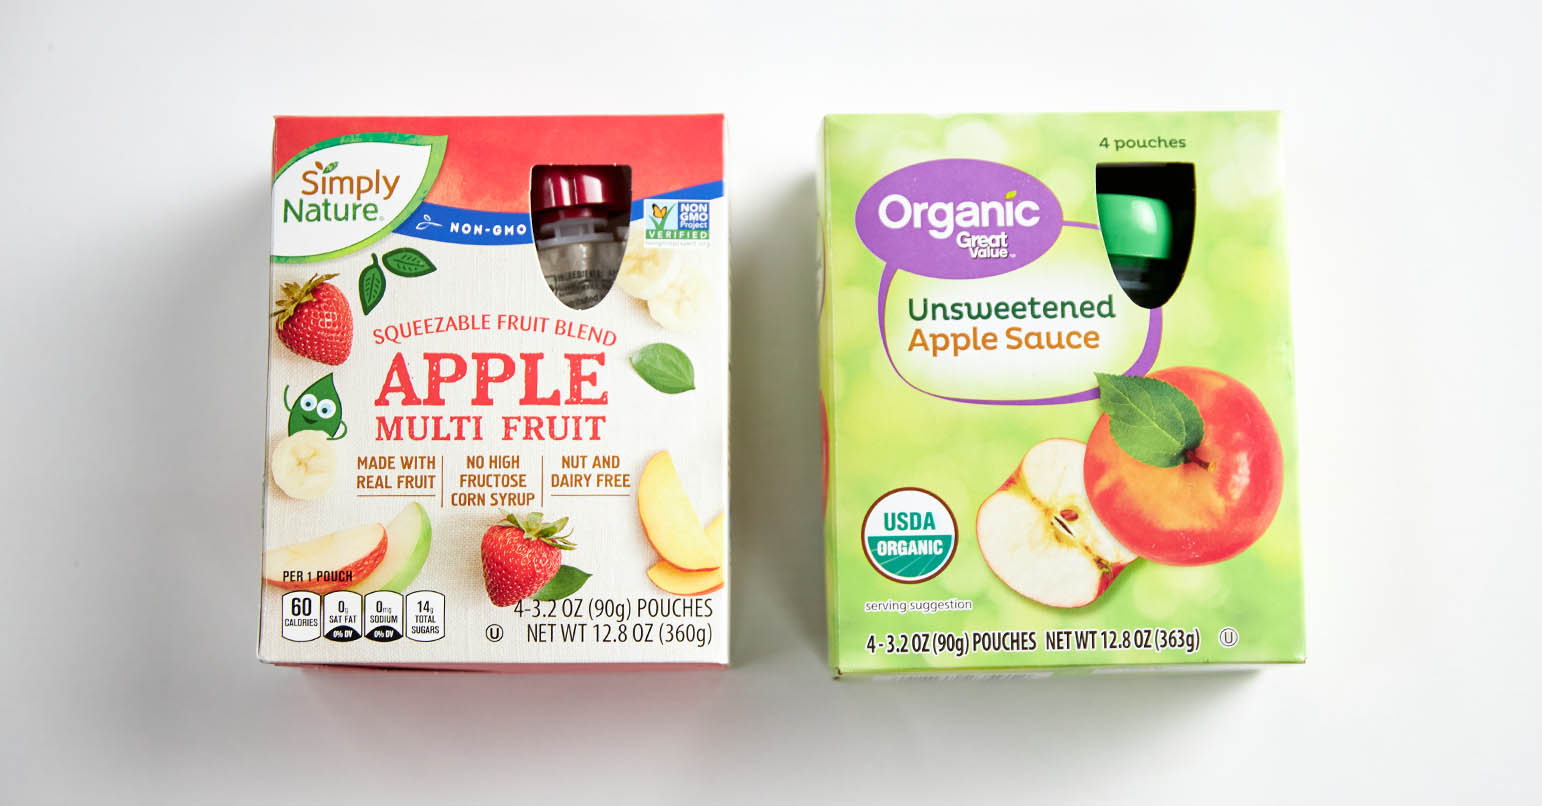 Aldi vs Walmart Applesauce